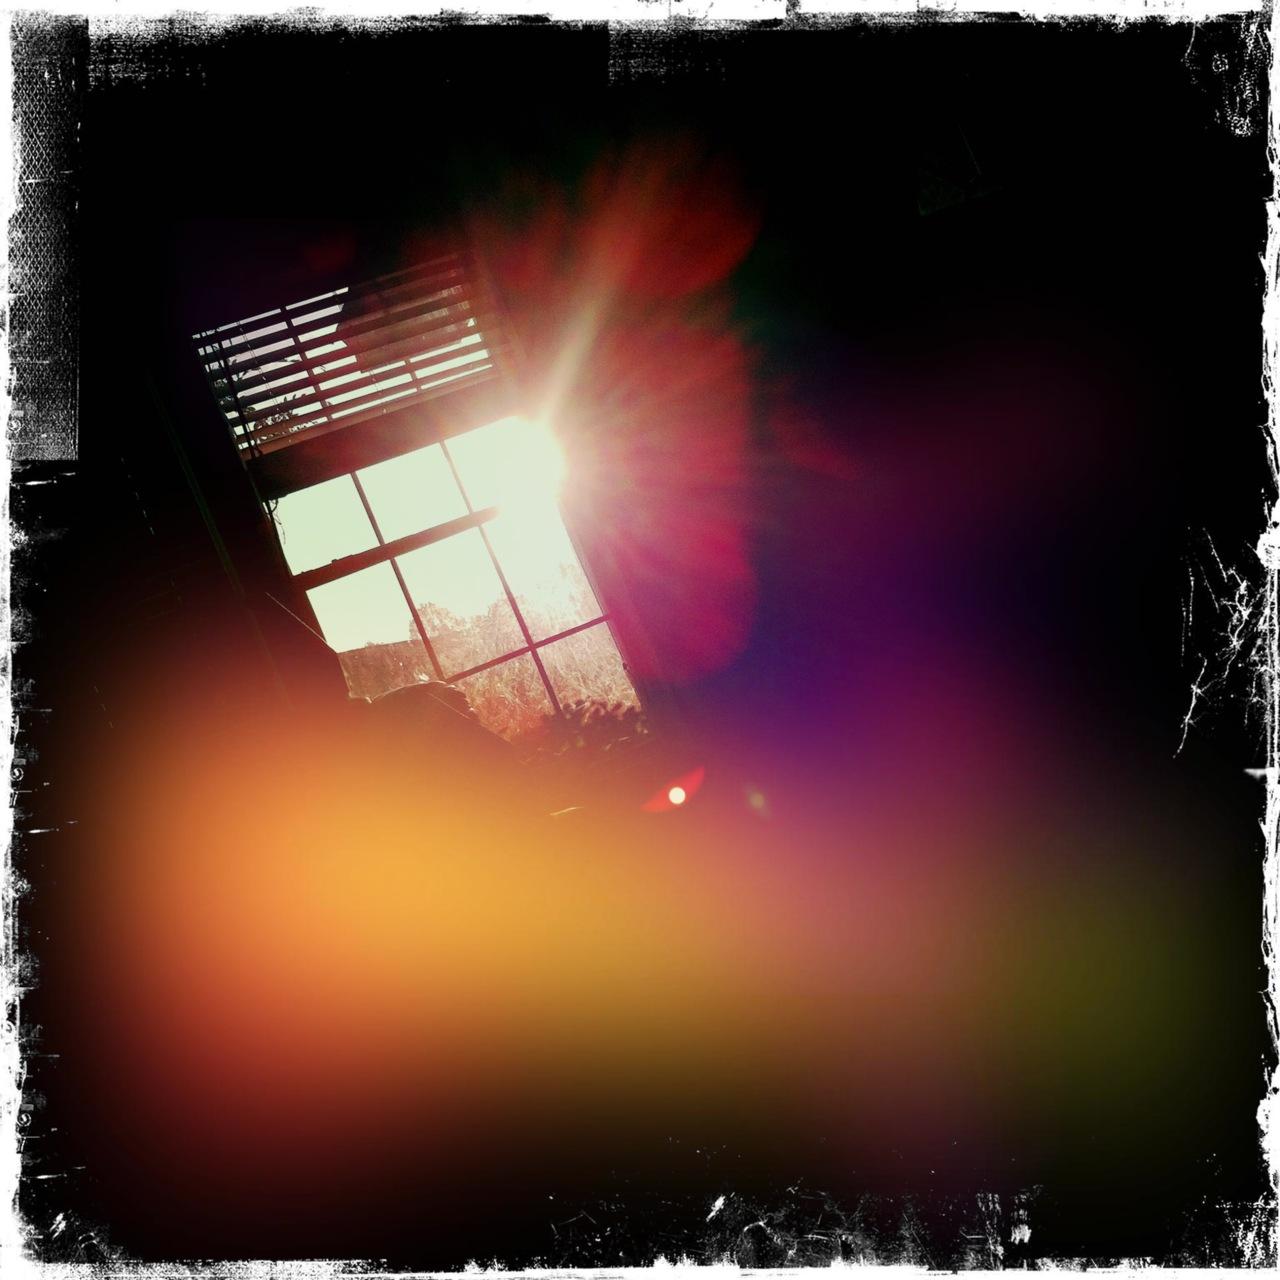 Morning sunrise window 3 John S Lens, Kodot XGrizzled Film, Dreampop Flash,